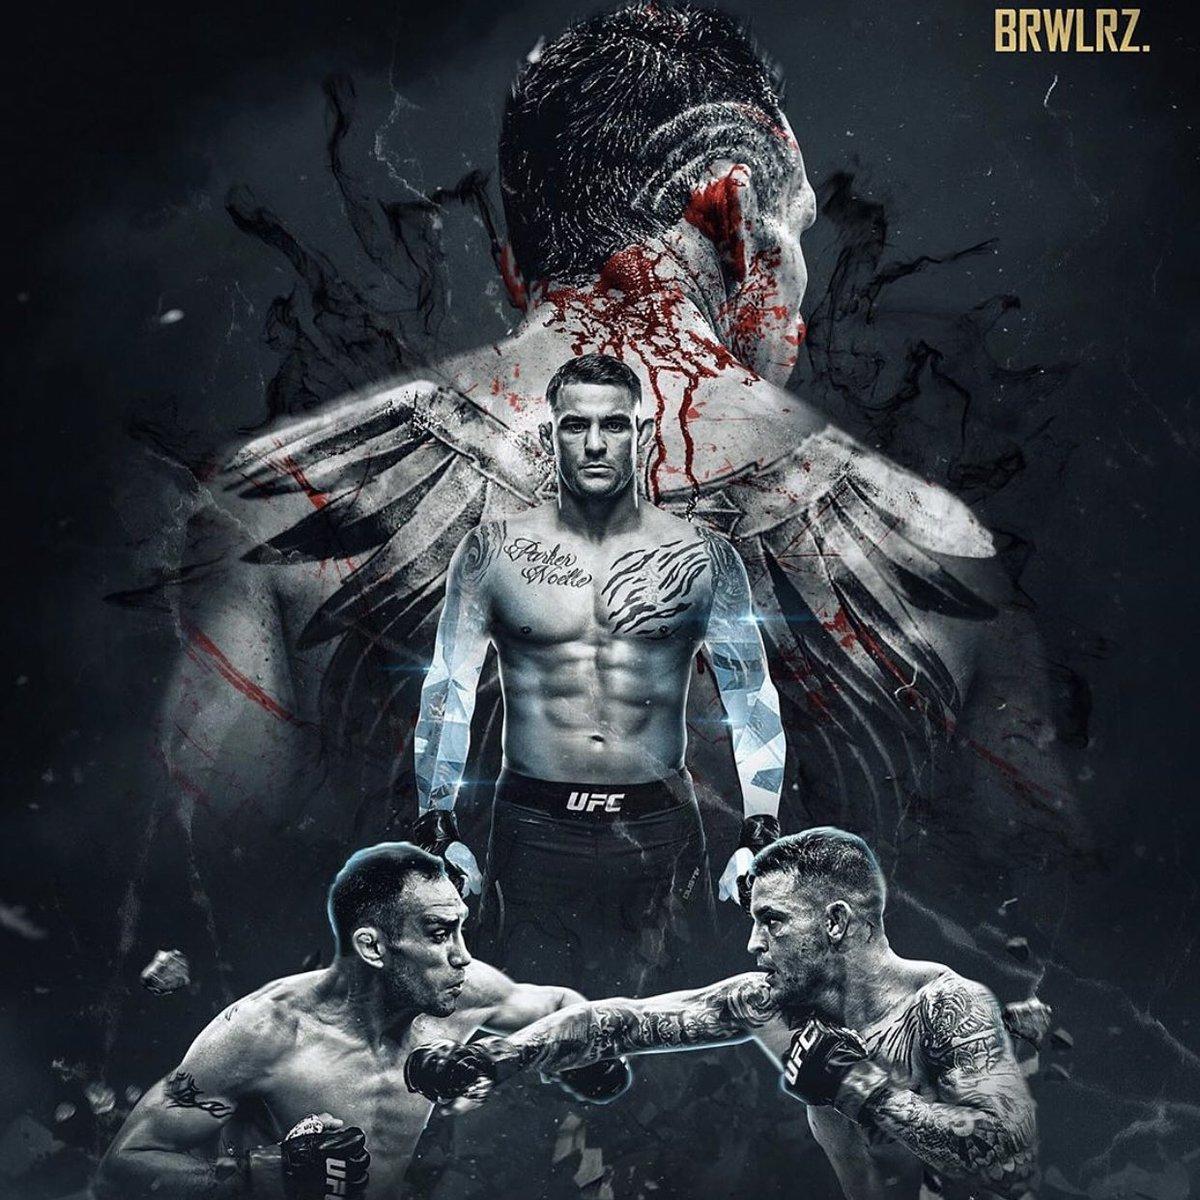 Who wants 5 rounds? El Diamante ⚔ El Cucuy  #PaidInFull #Blood #Titleshot https://t.co/7M51ud53k6